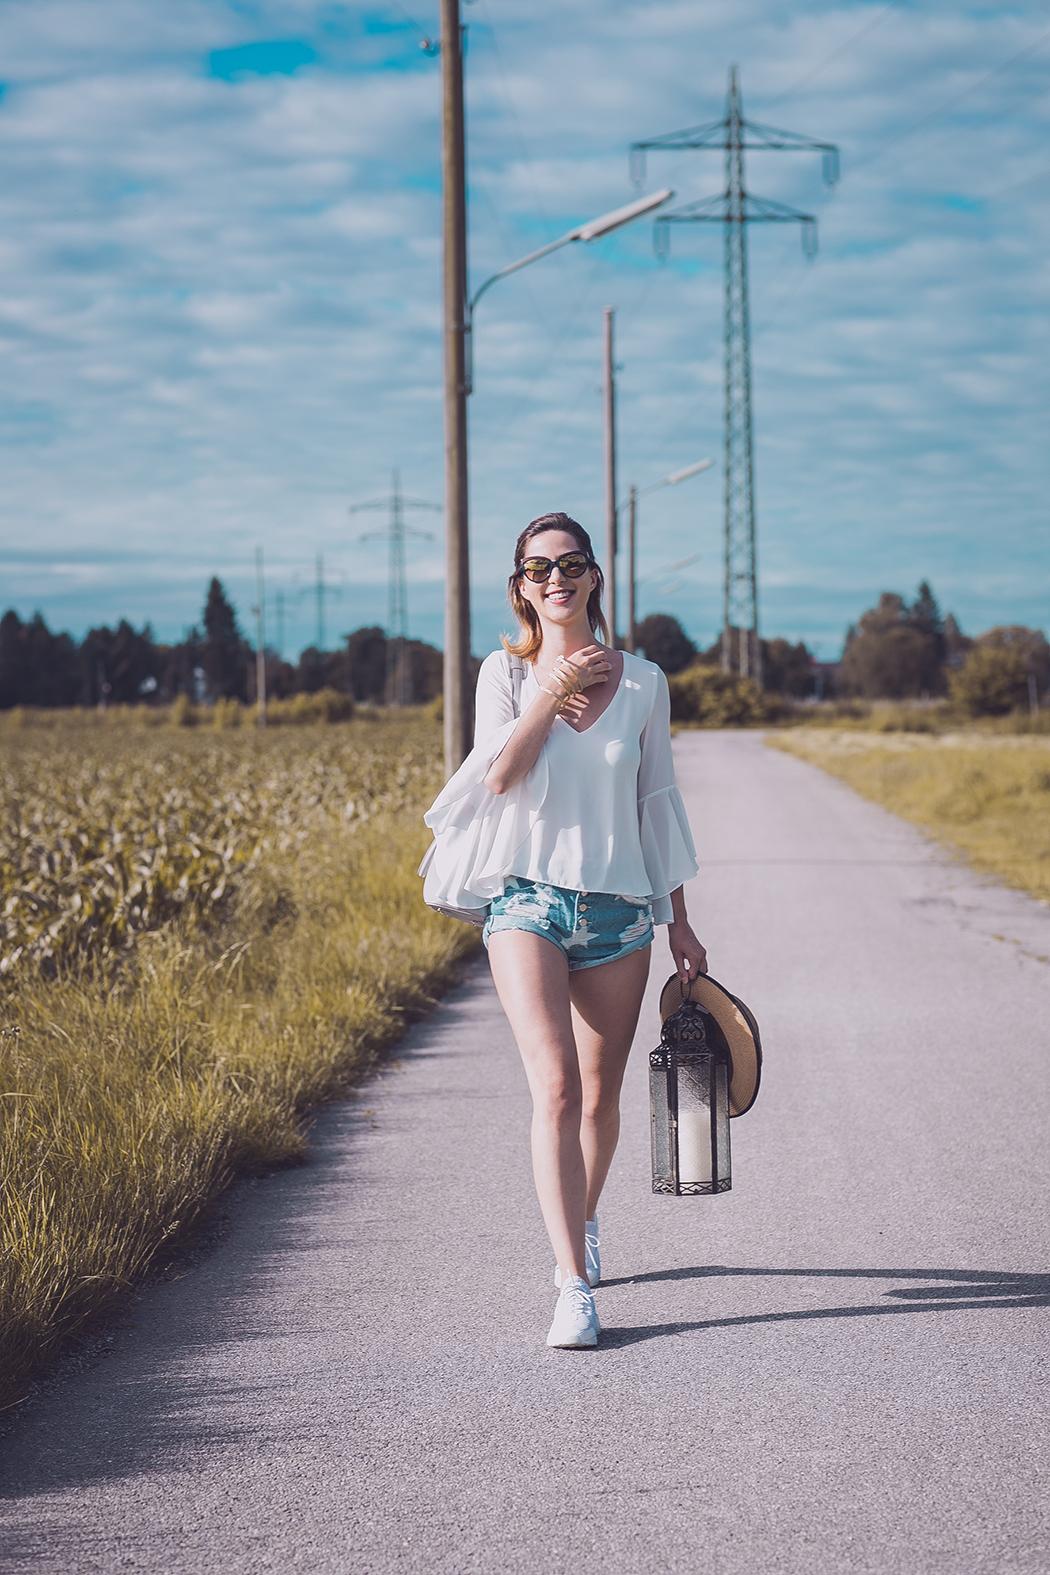 Fashionblog-Fashionblogger-Fashion-Blog-Blogger-Muenchen-Deutschland-Any-Di-Tasche-Picknick-Lindarella-12-web